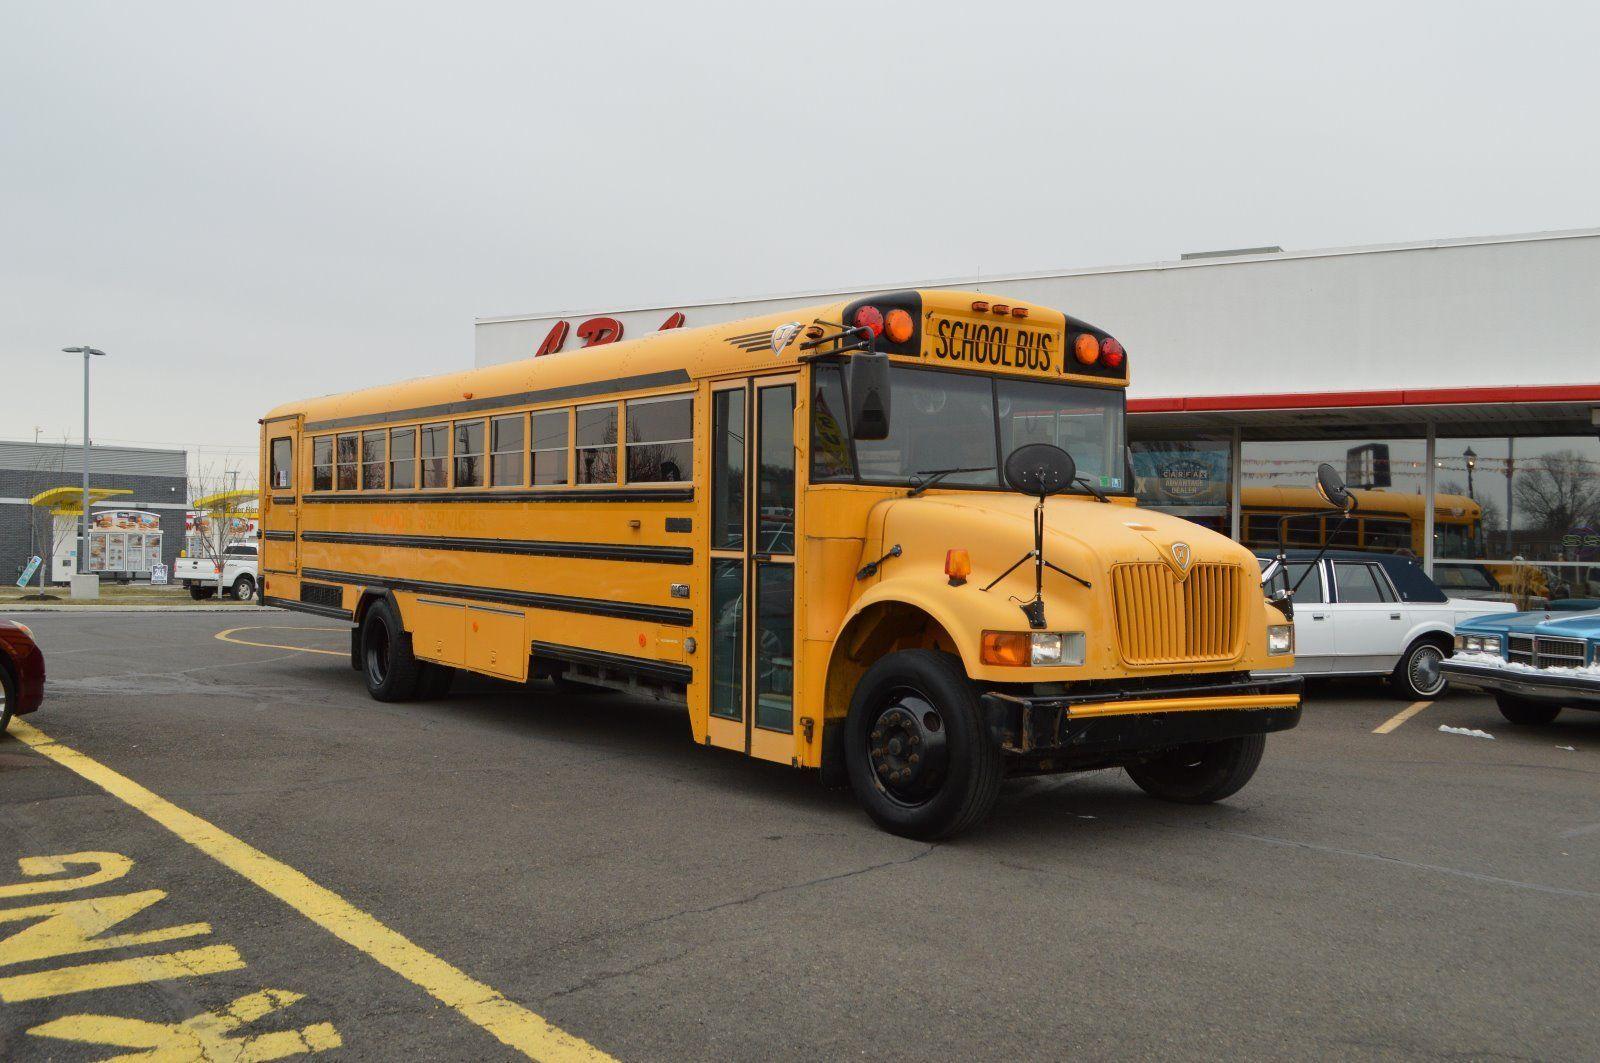 2004 INTERNATIONAL CE-300 DT 466 TURBO DIESEL BUS for sale